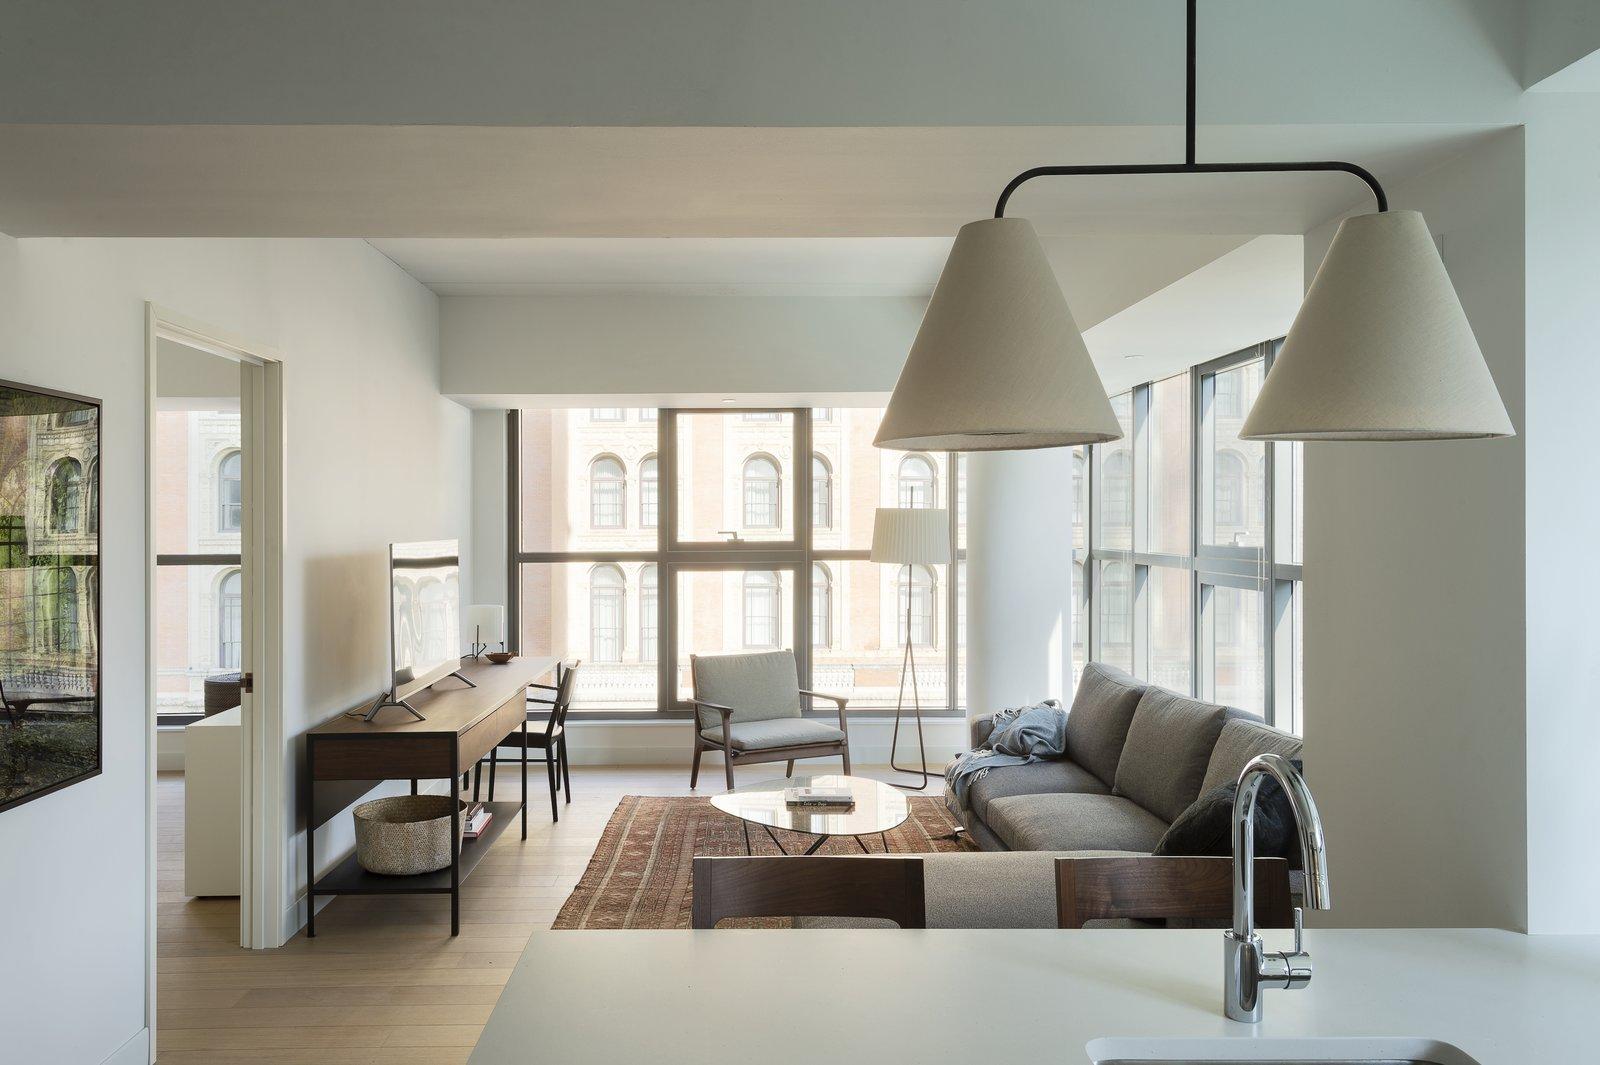 Living Room, Lamps, Console Tables, Rug Floor, Light Hardwood Floor, Sectional, Desk, Floor Lighting, Pendant Lighting, Coffee Tables, Table Lighting, and Chair  ROOST Apartment Hotel